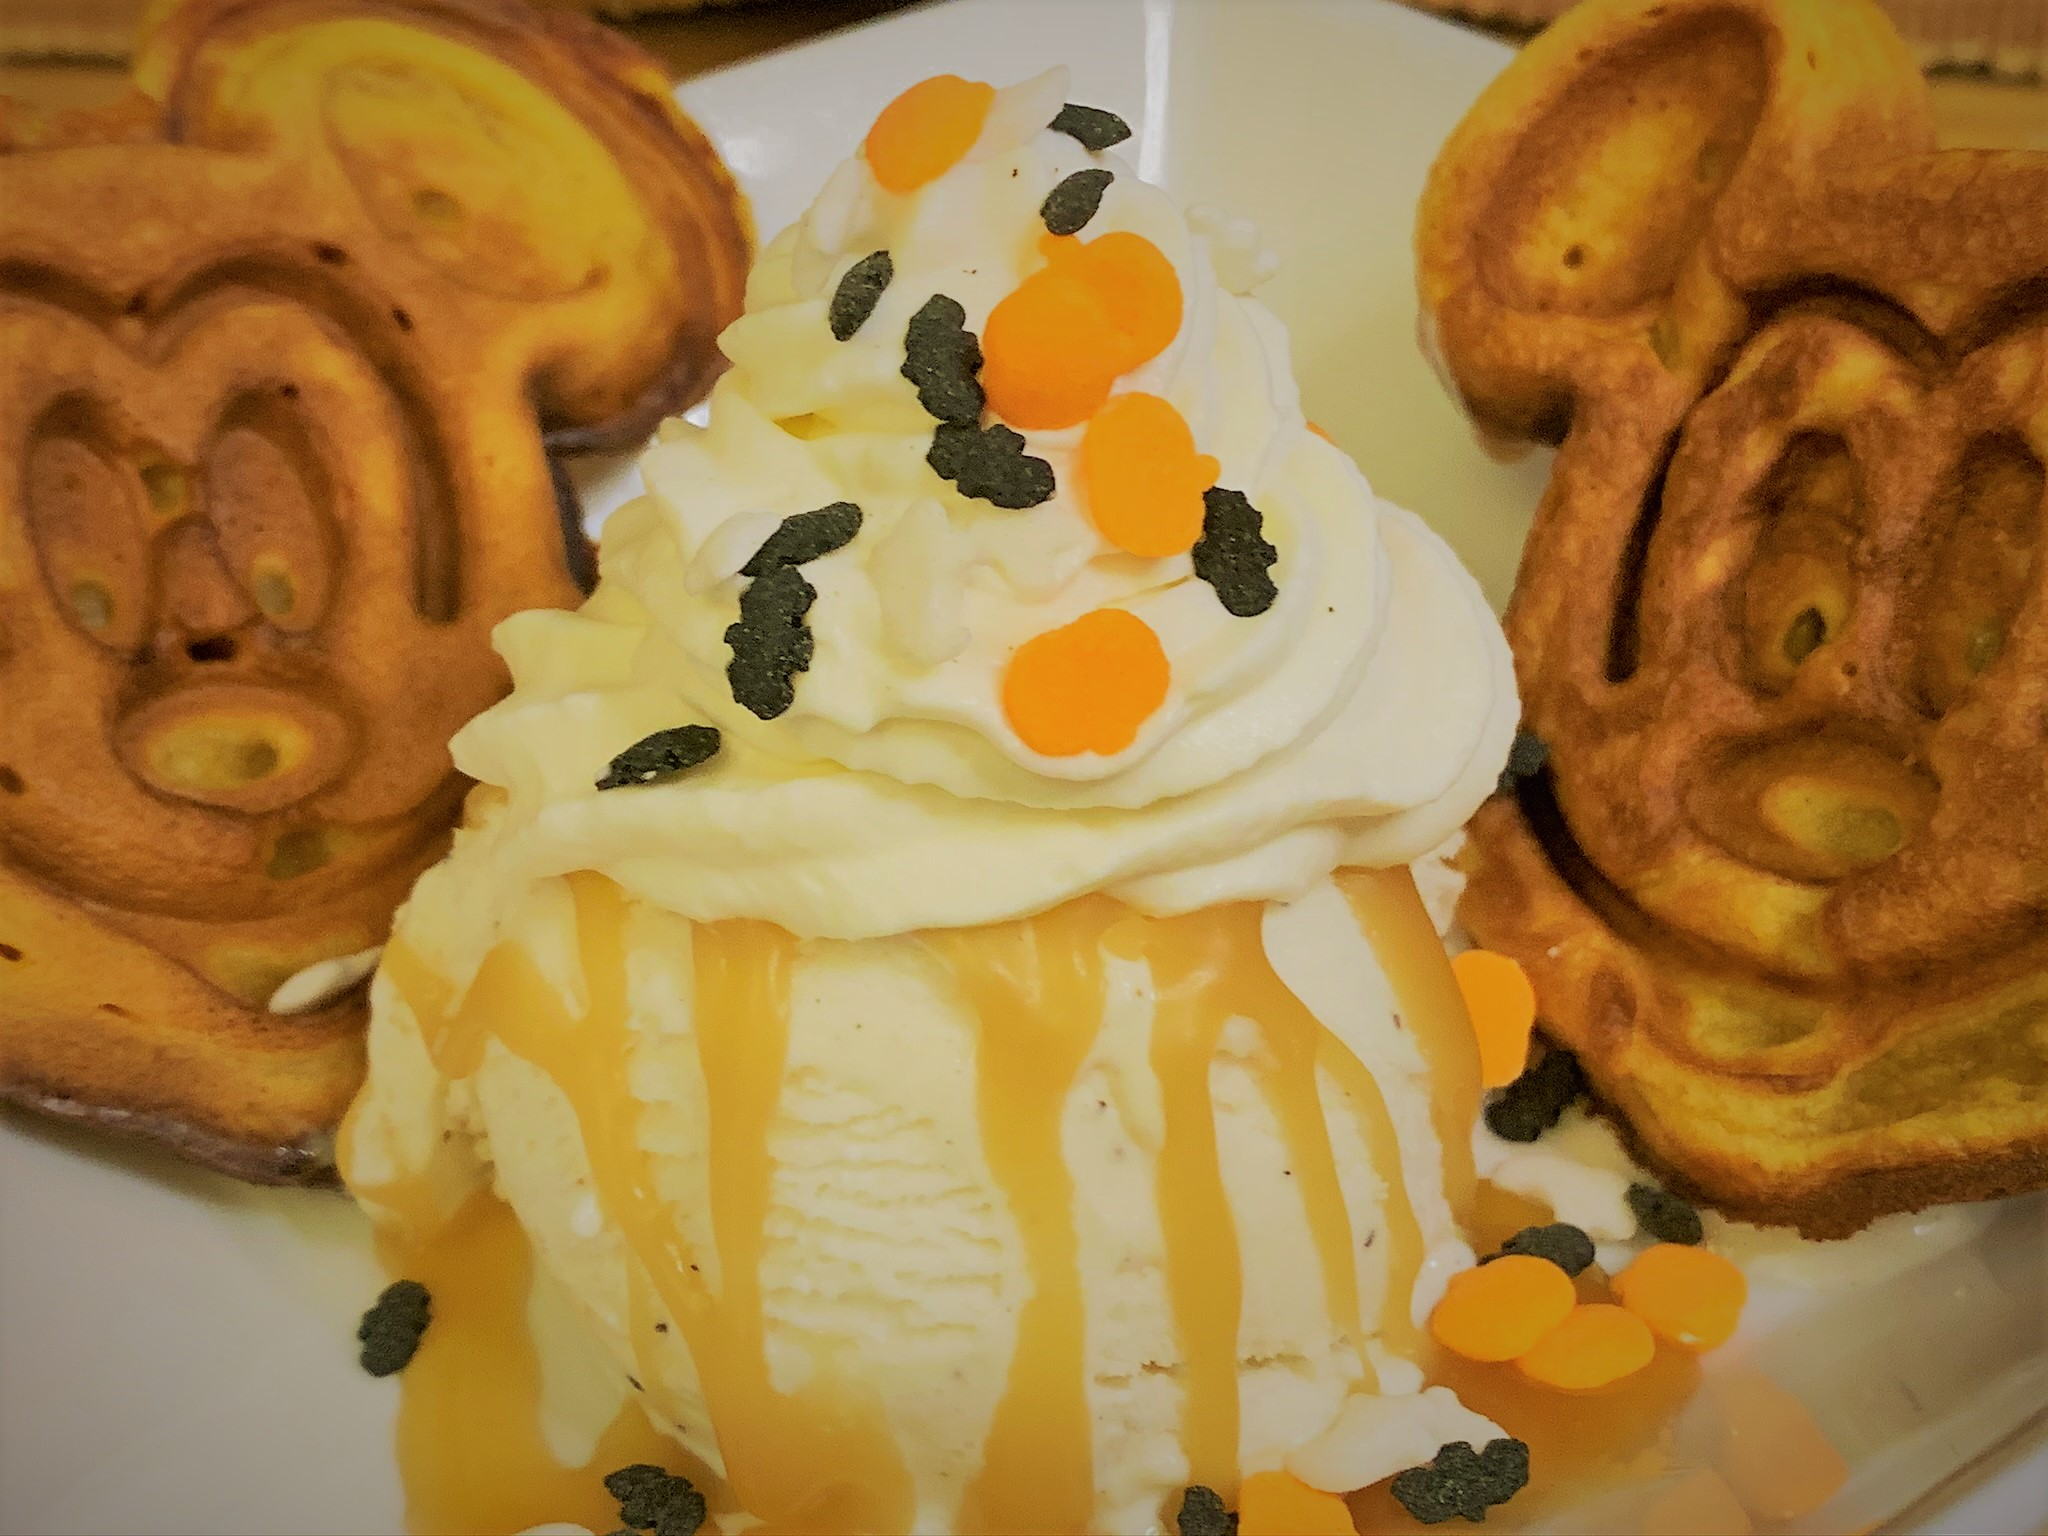 Our fully plated Pumpkin Spice Waffle Sundae